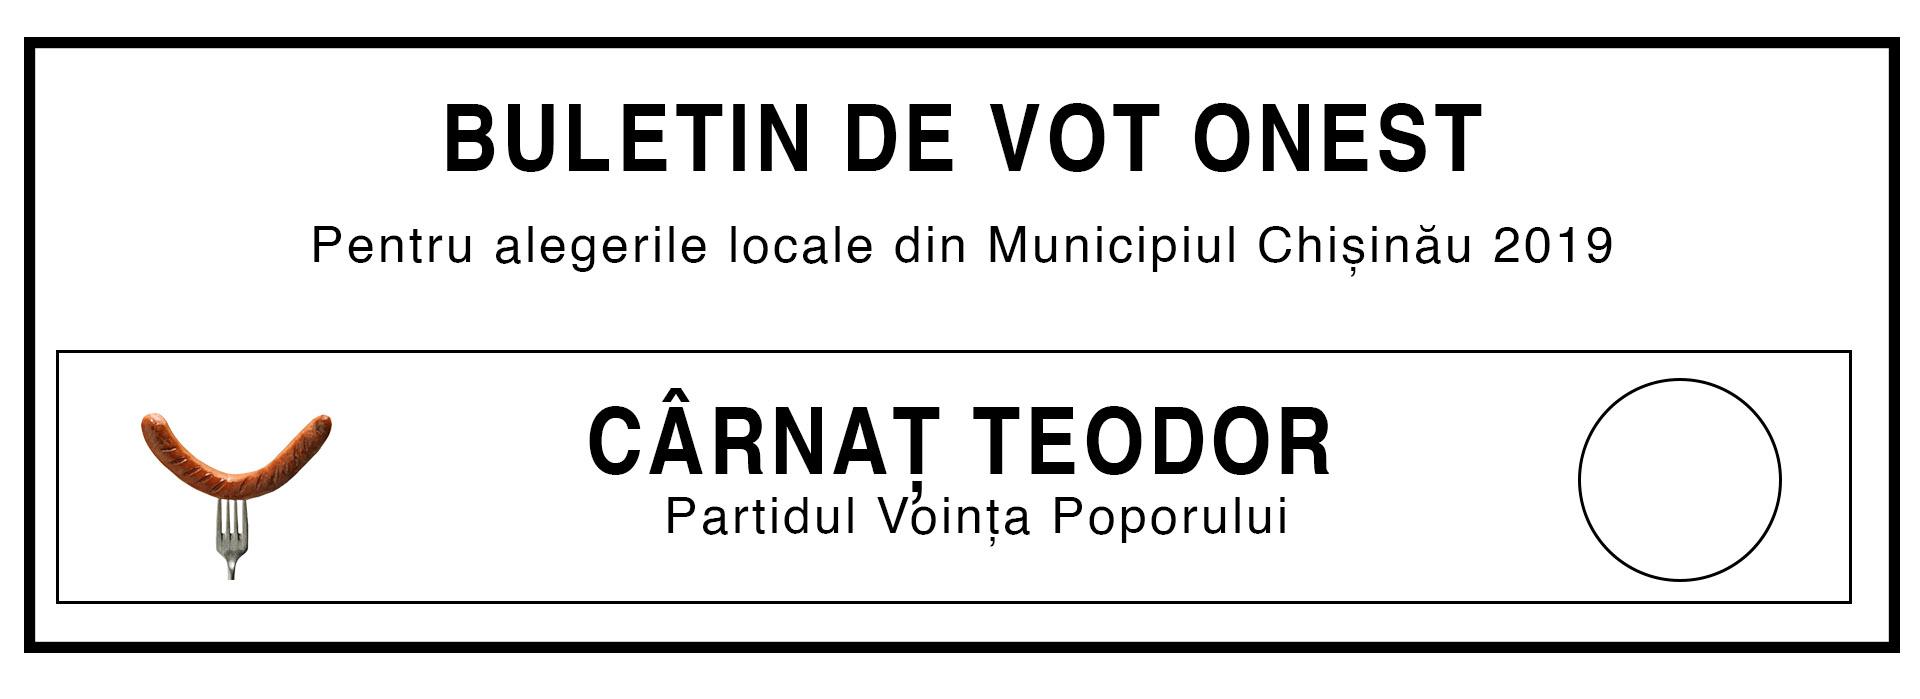 Carnat Teodor Jpeg